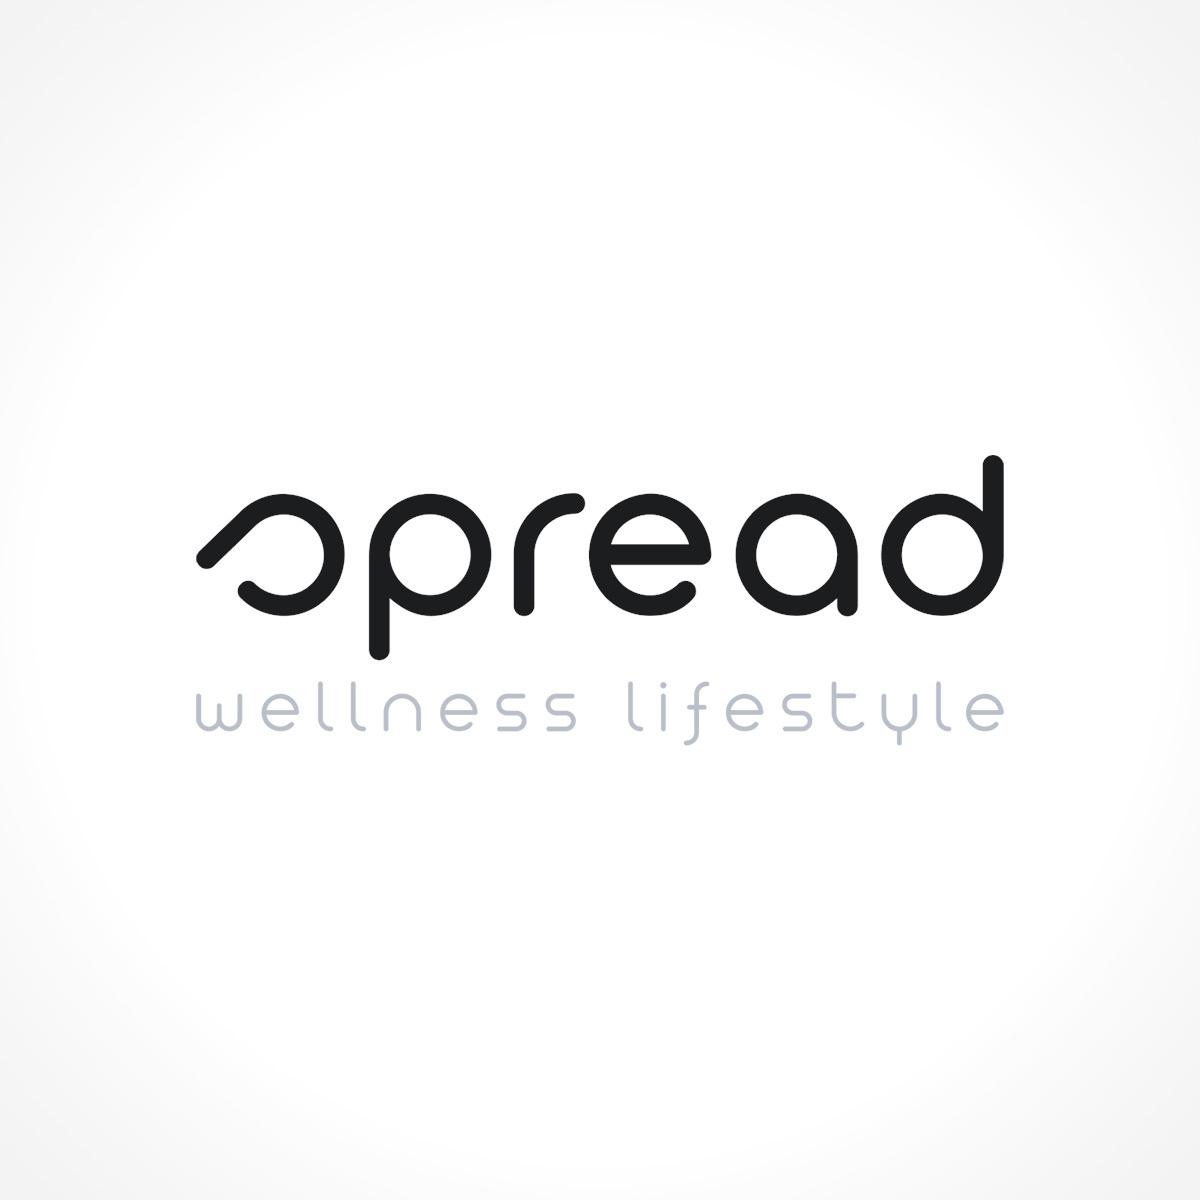 Spread wellness lifestyle